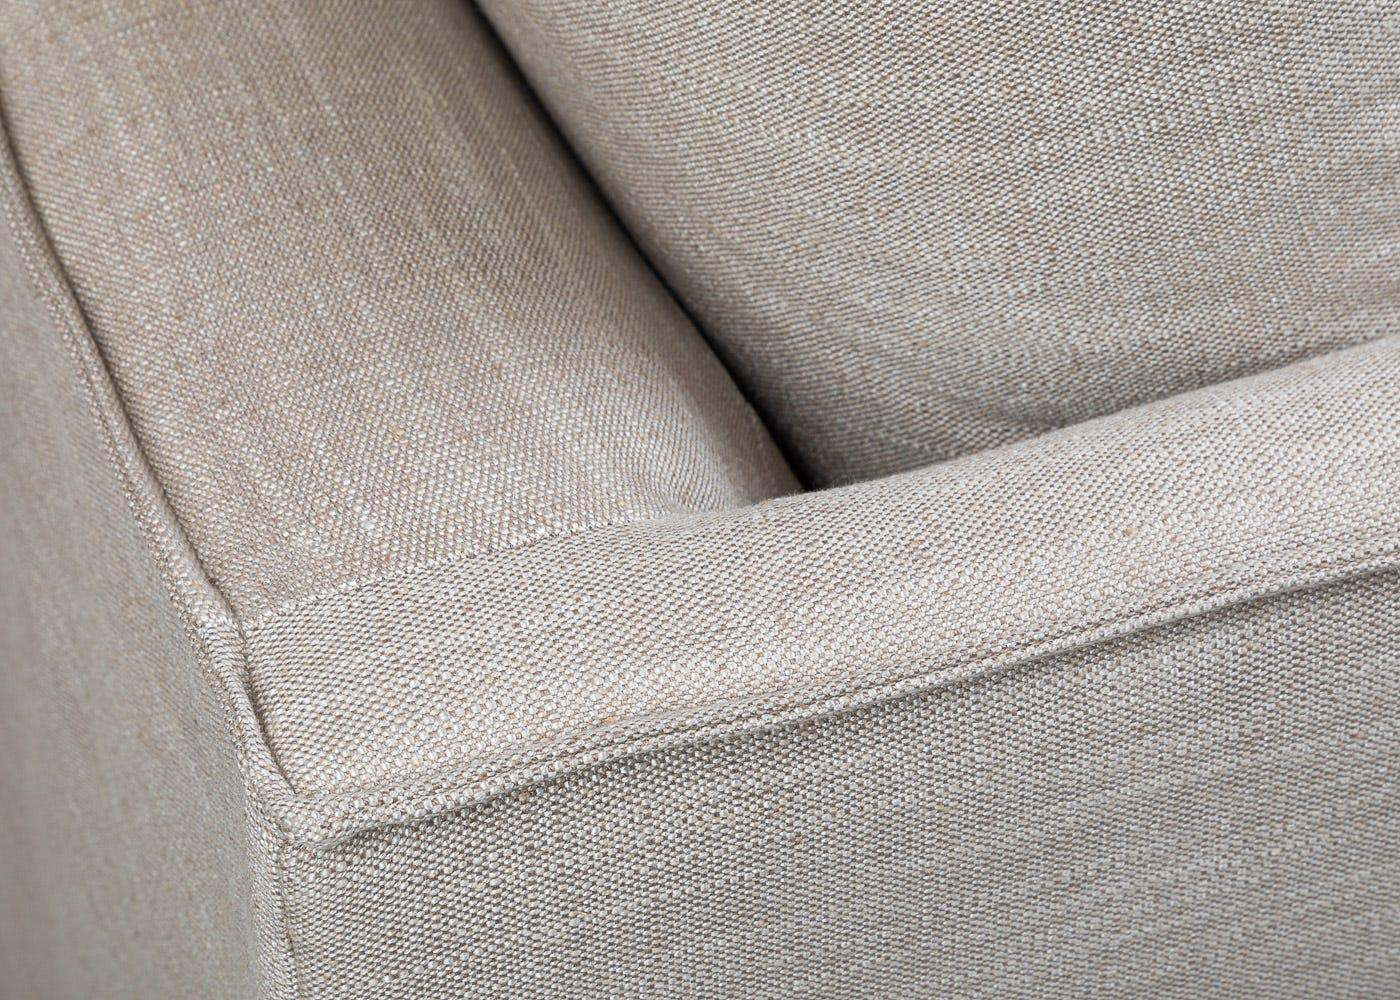 Tortona 4 Seater Sofa in Broad Weave Putty - Corner